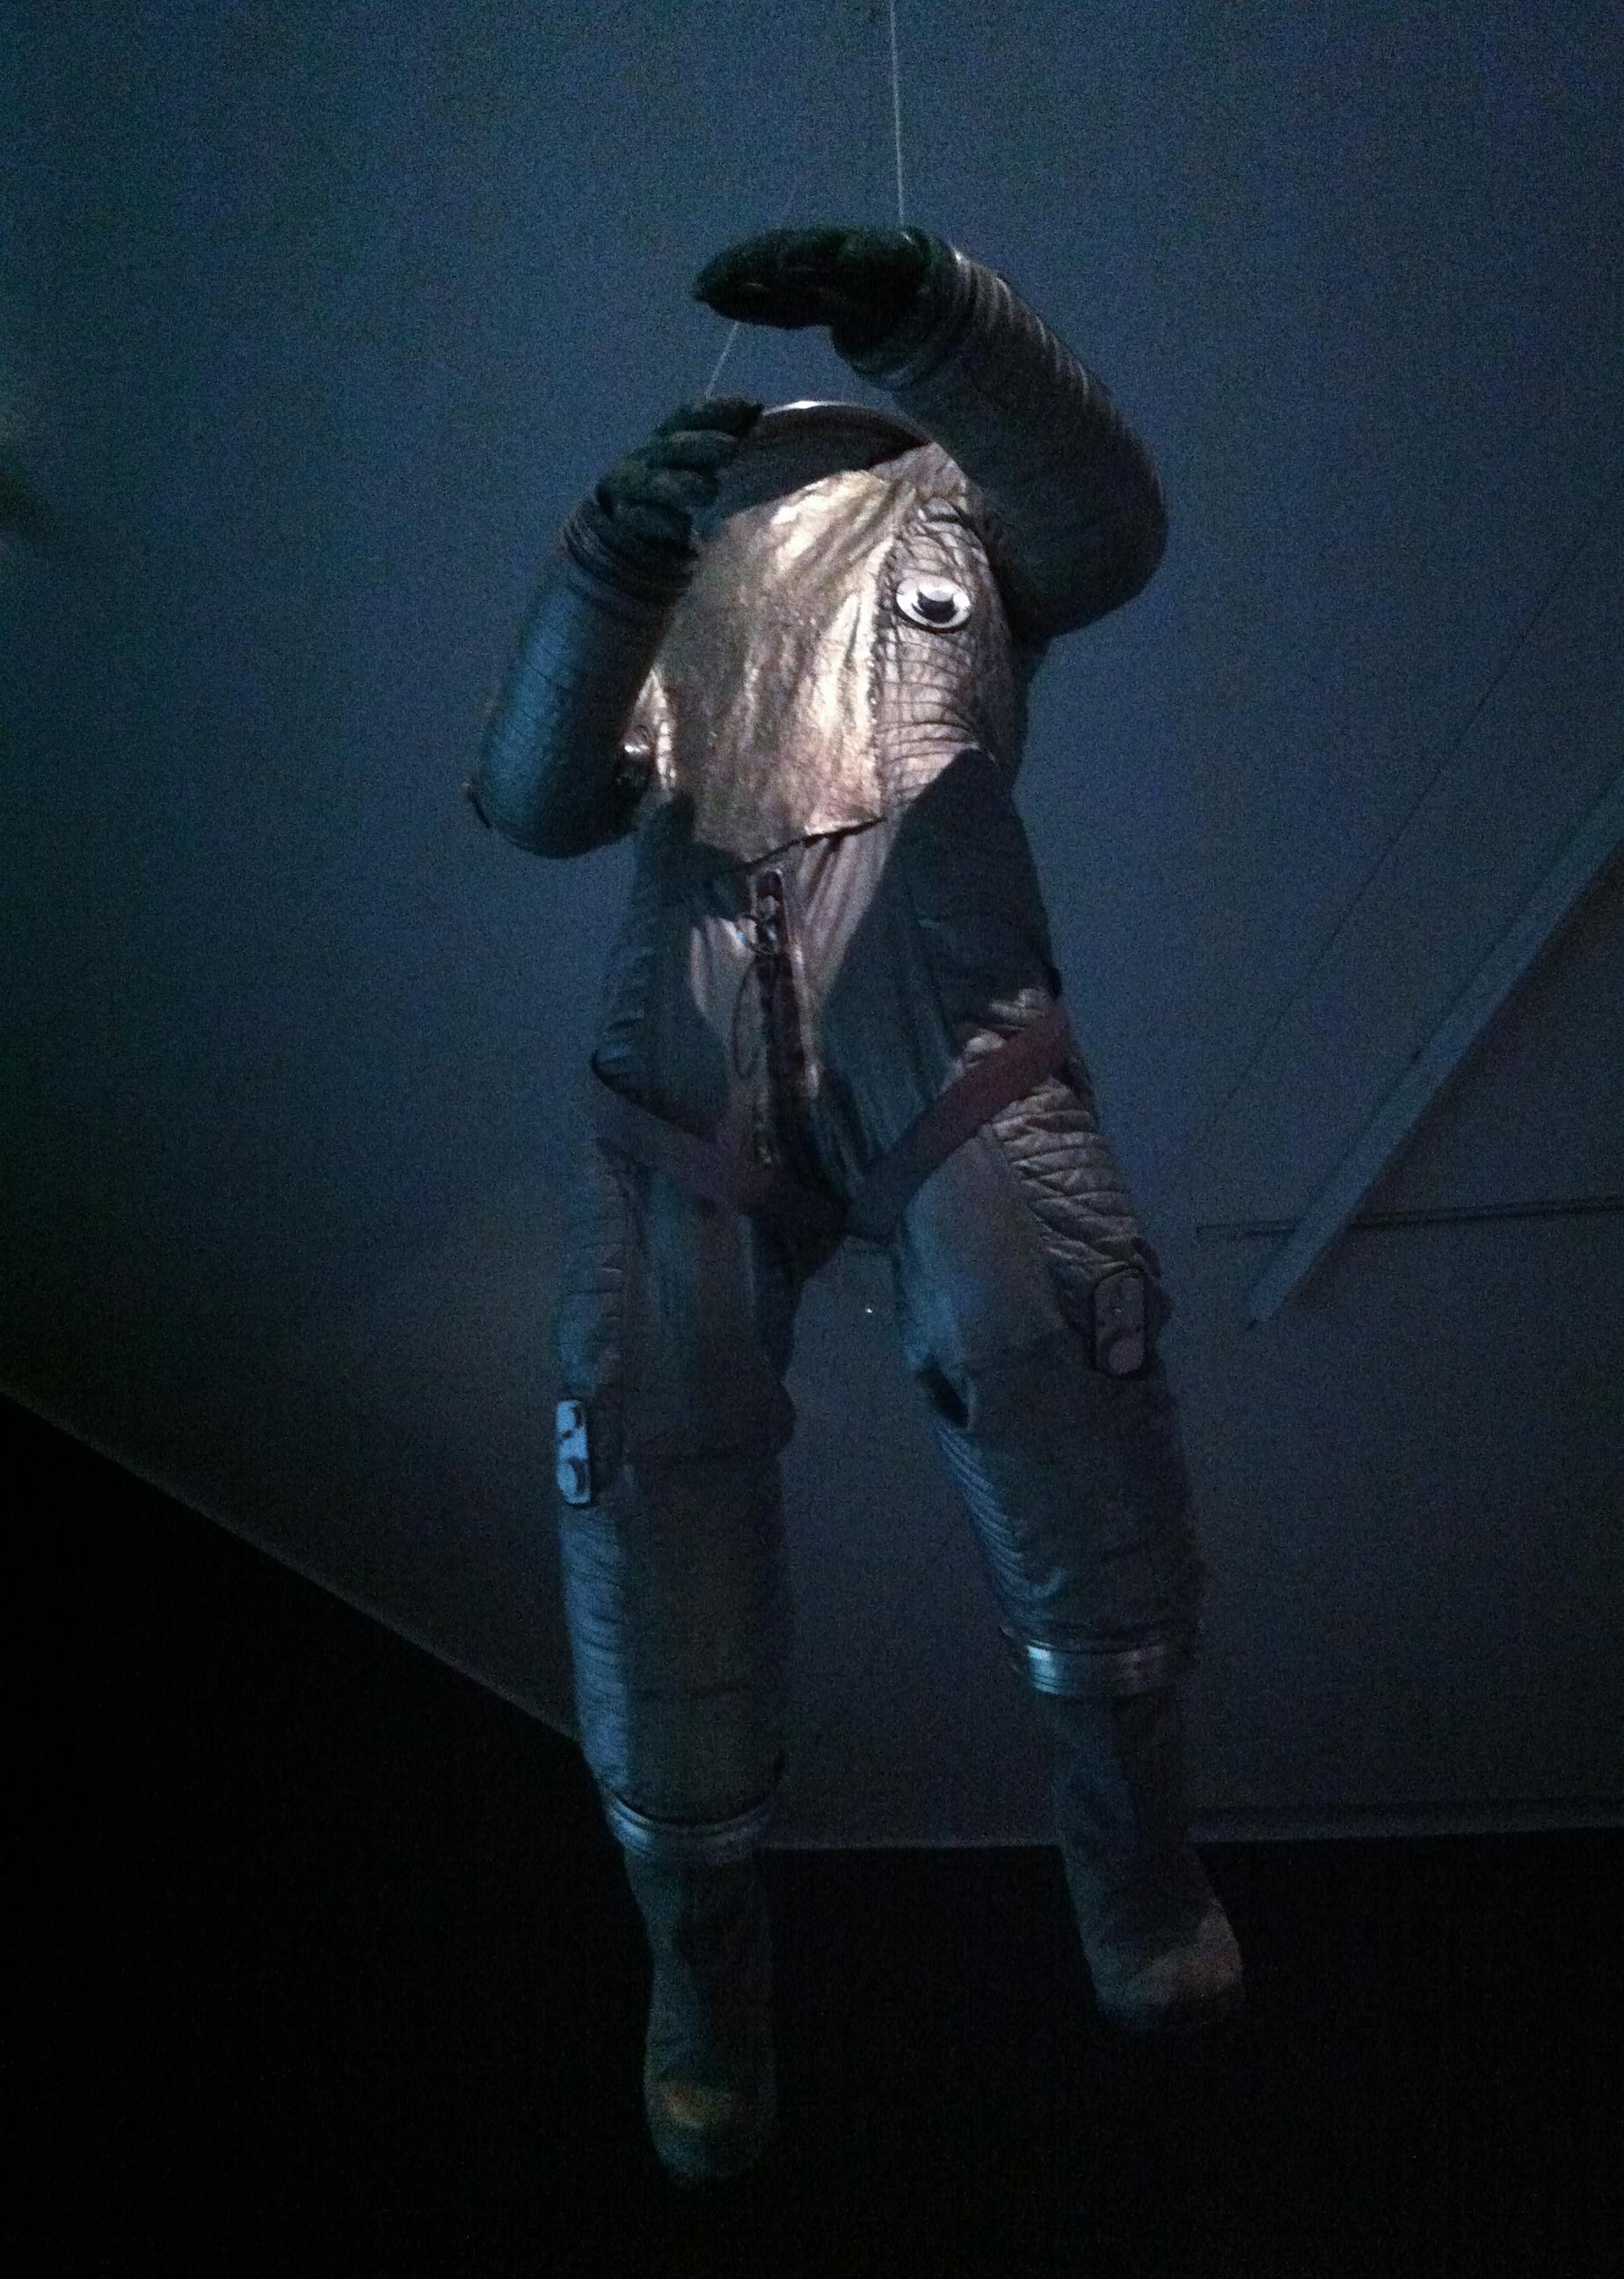 2001 space suit movie - photo #8